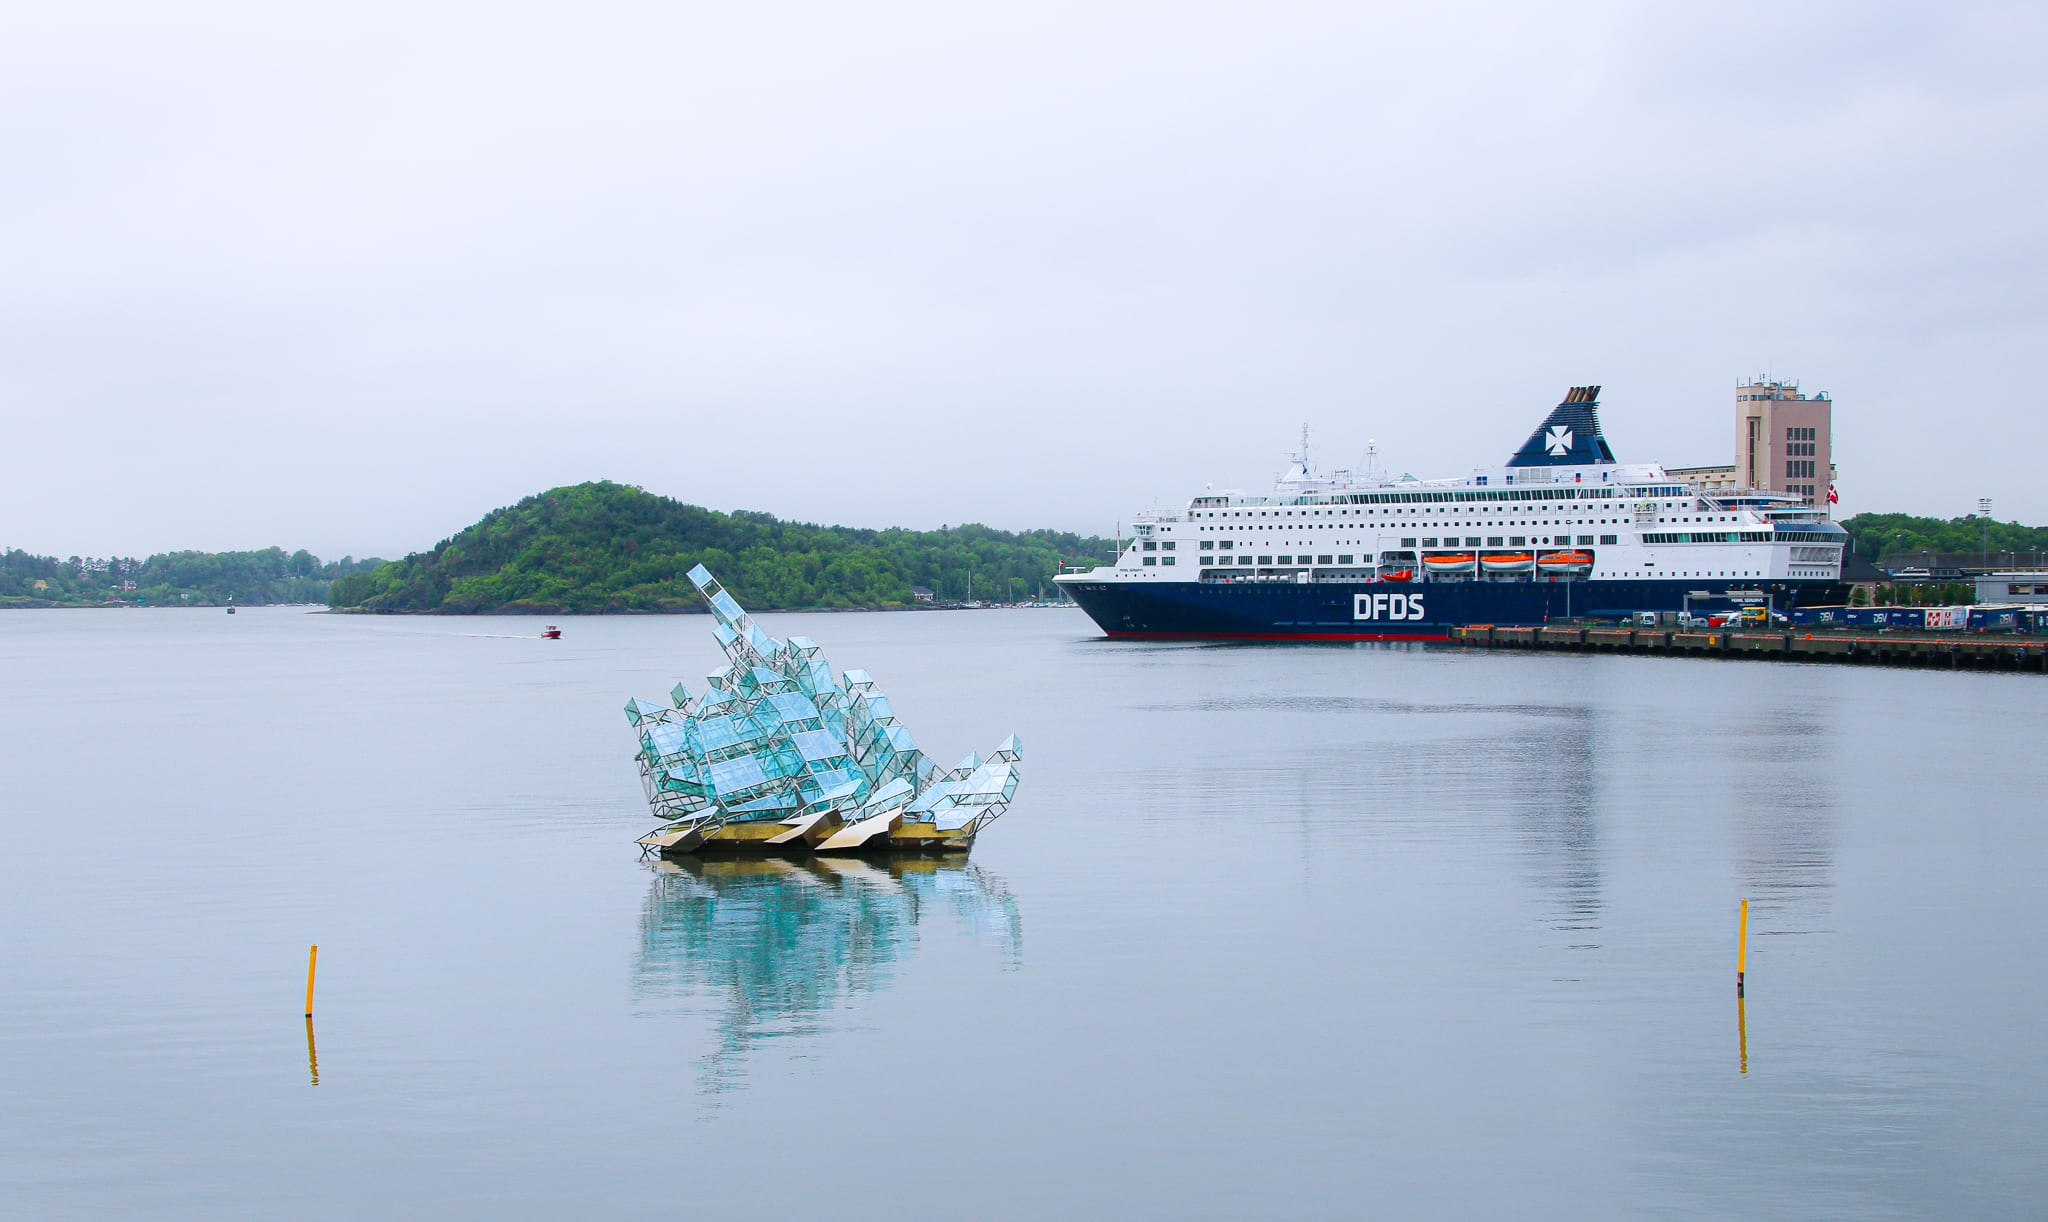 DFDS Oslo